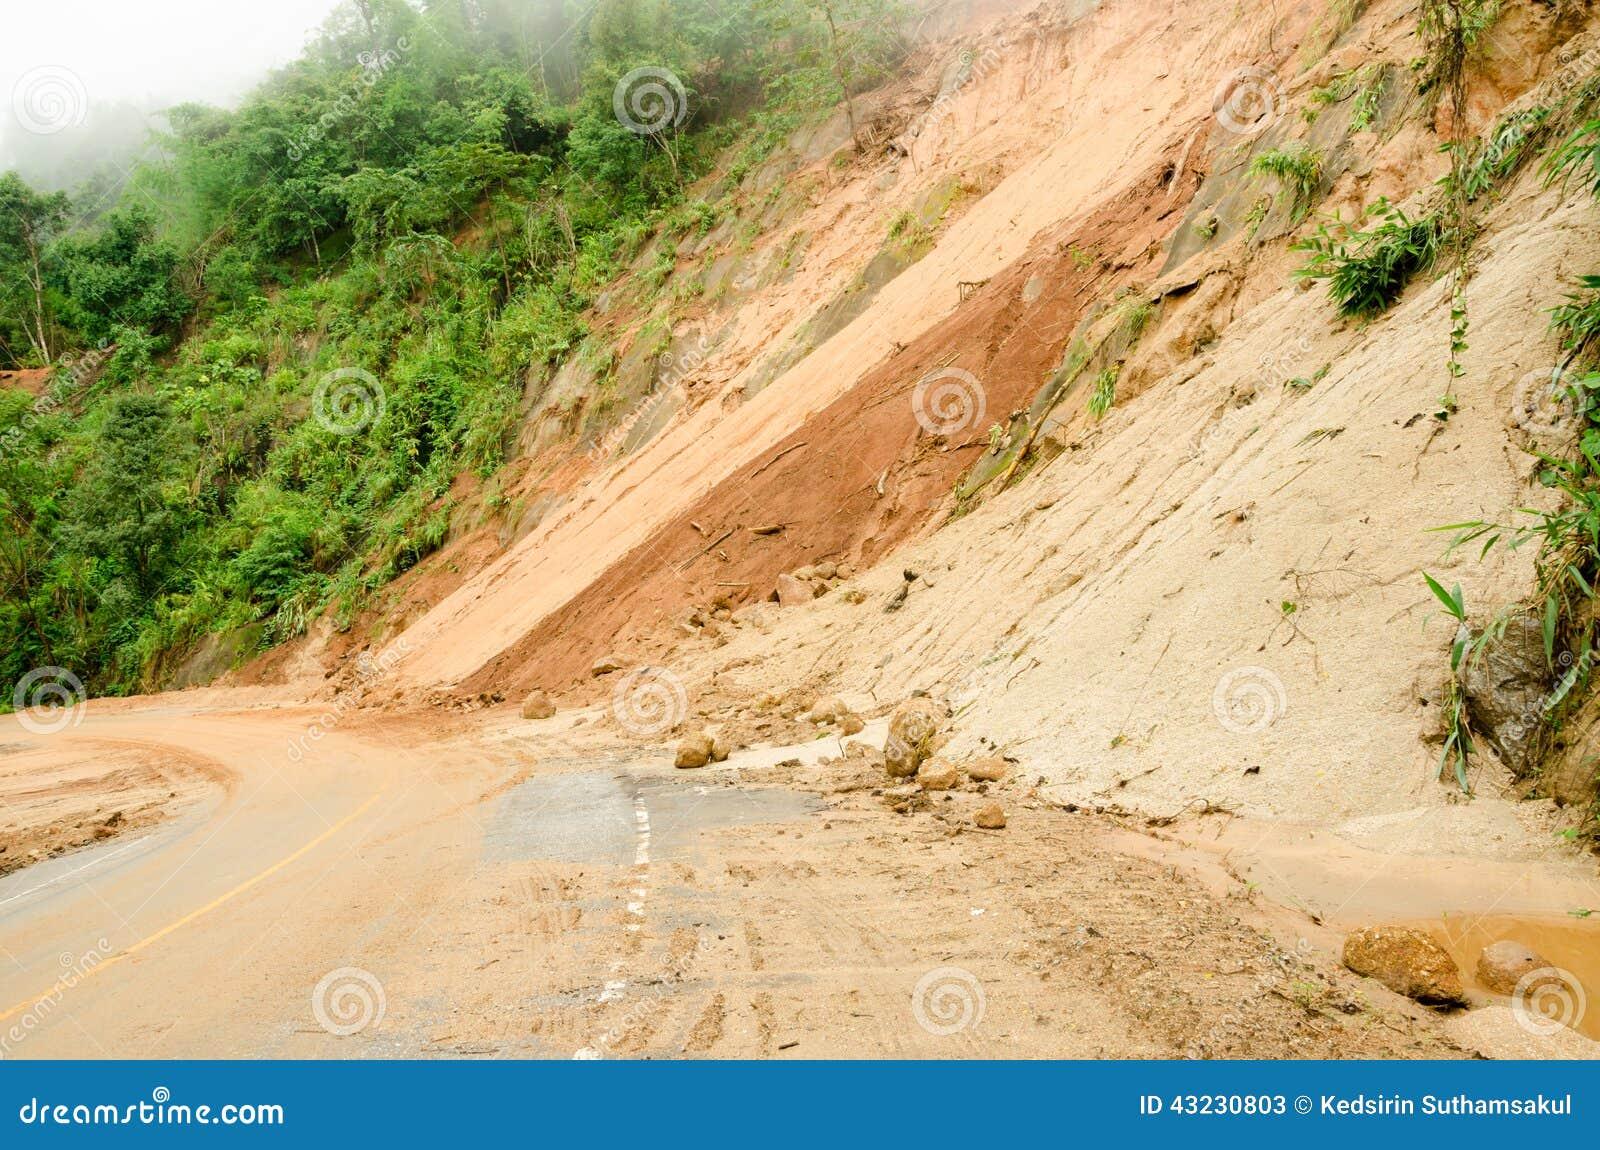 Geology Careers Natural Disasters